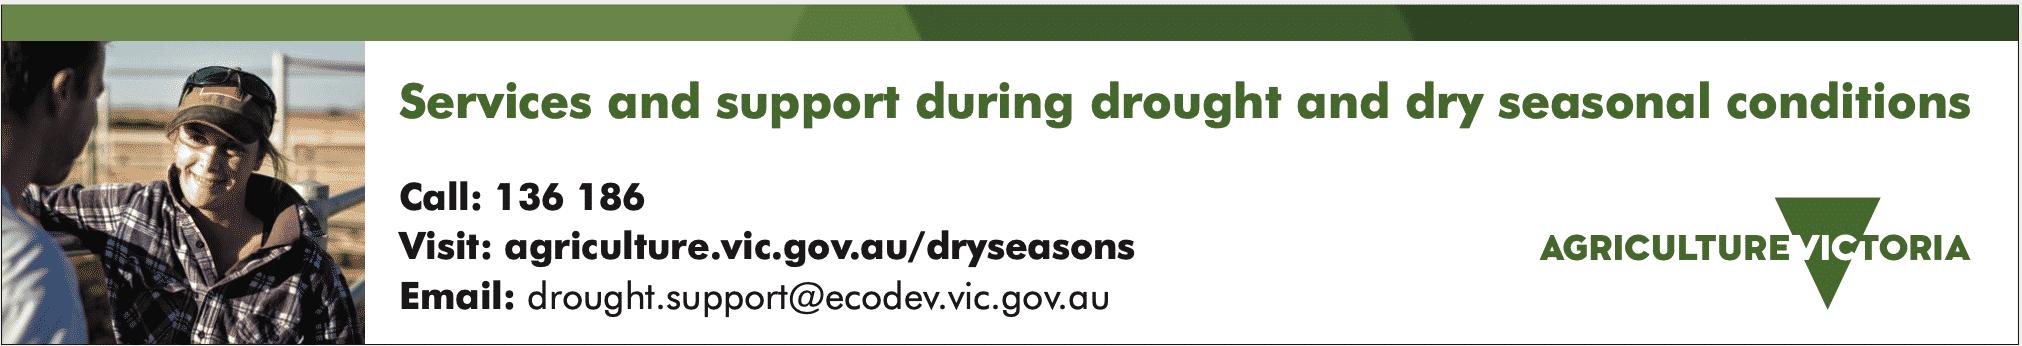 Ag-vic DrySeasons